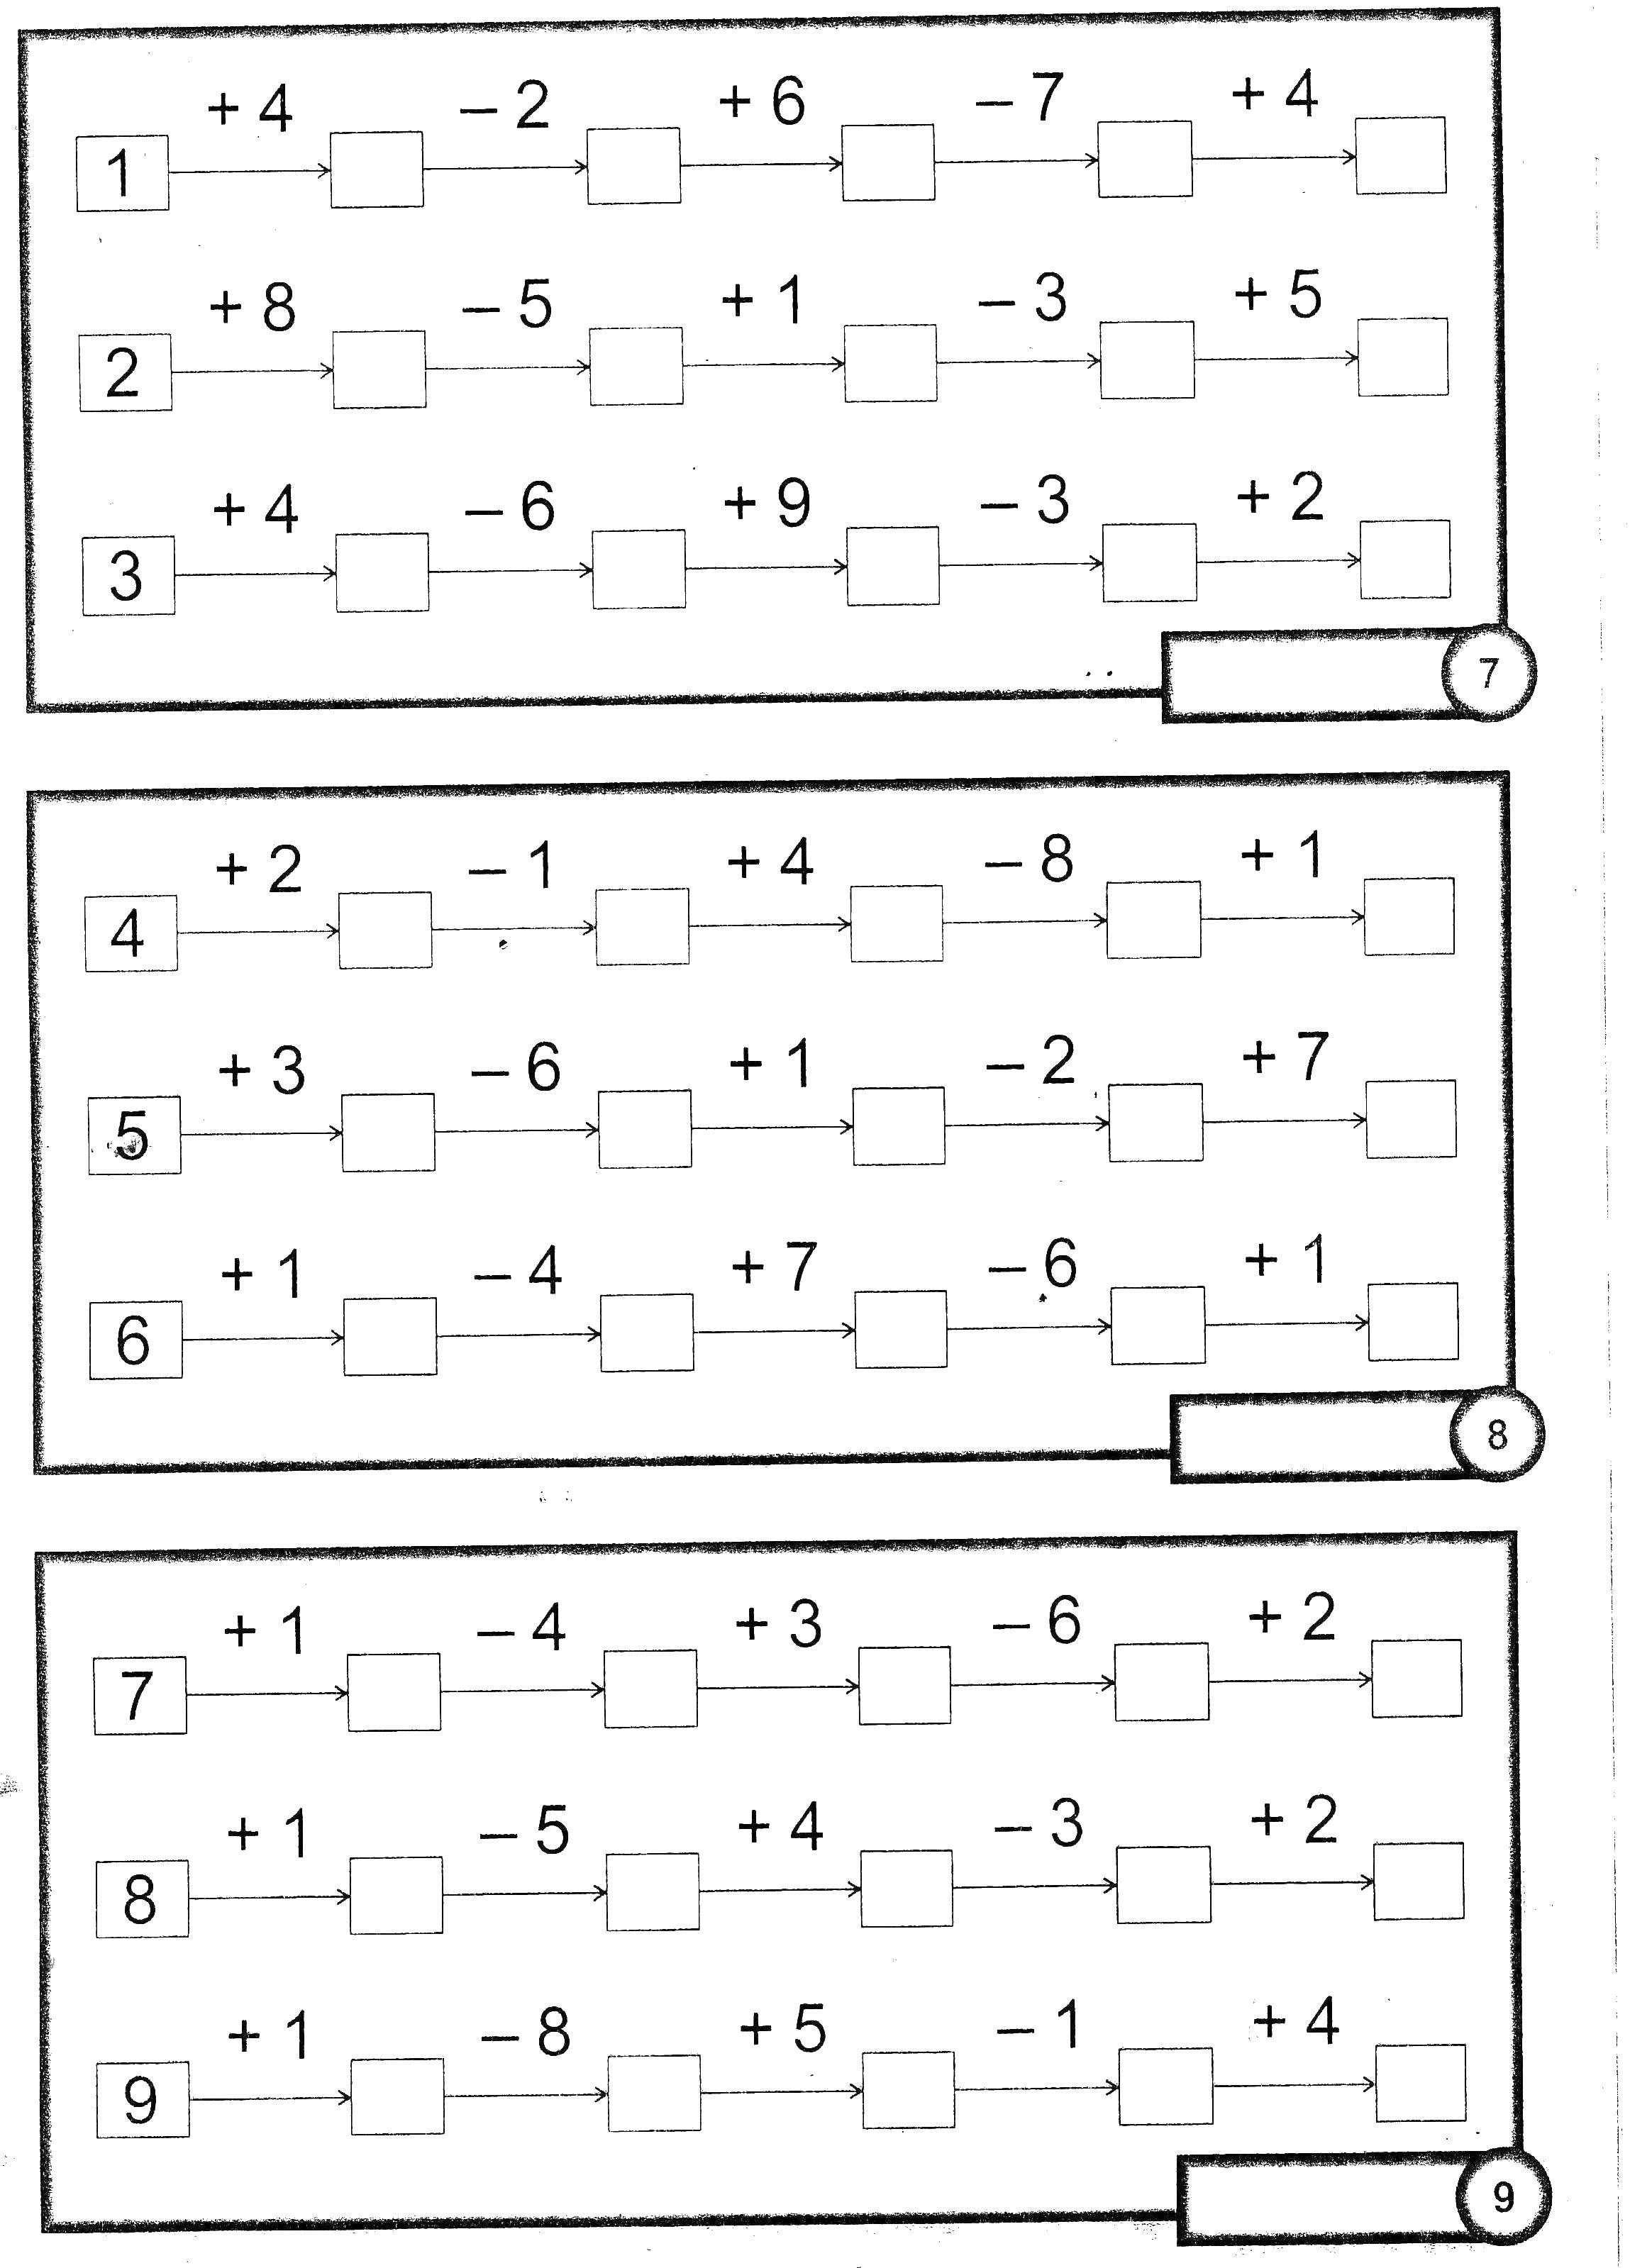 Coloring pages math riddles Скачать .  Распечатать